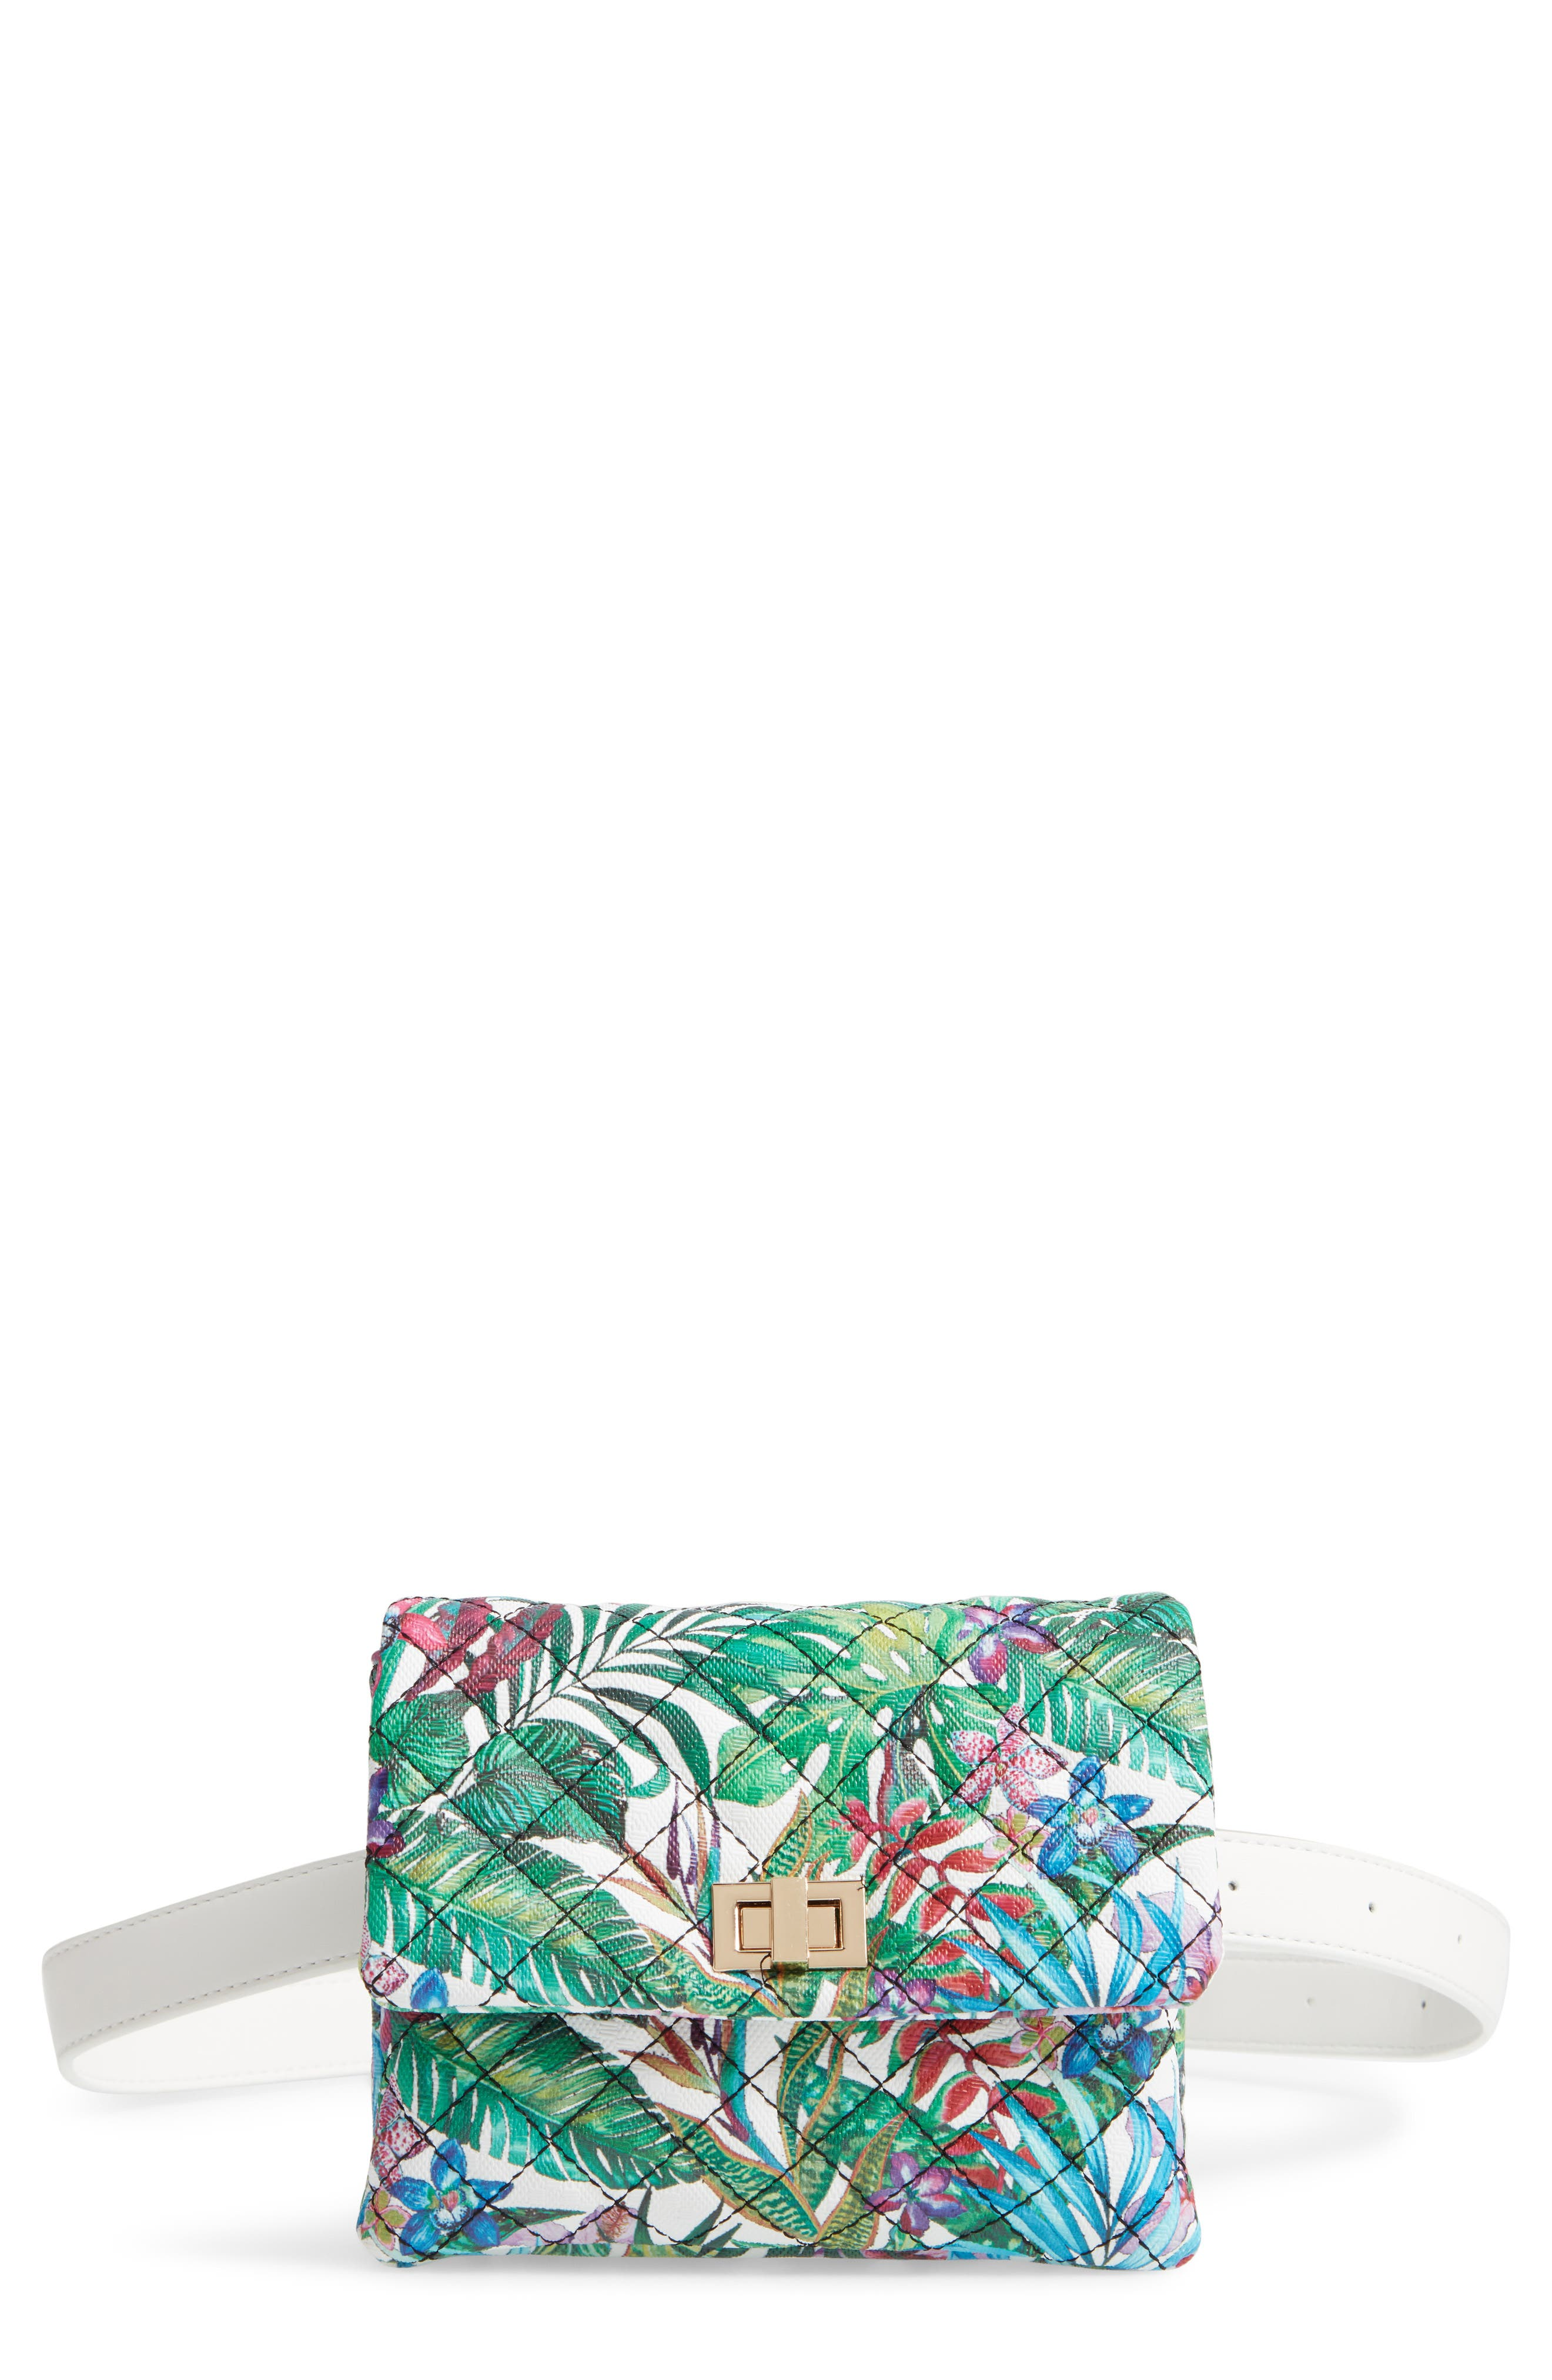 MALI + LILI Quilted Vegan Leather Belt Bag, Main, color, WHITE FLORAL